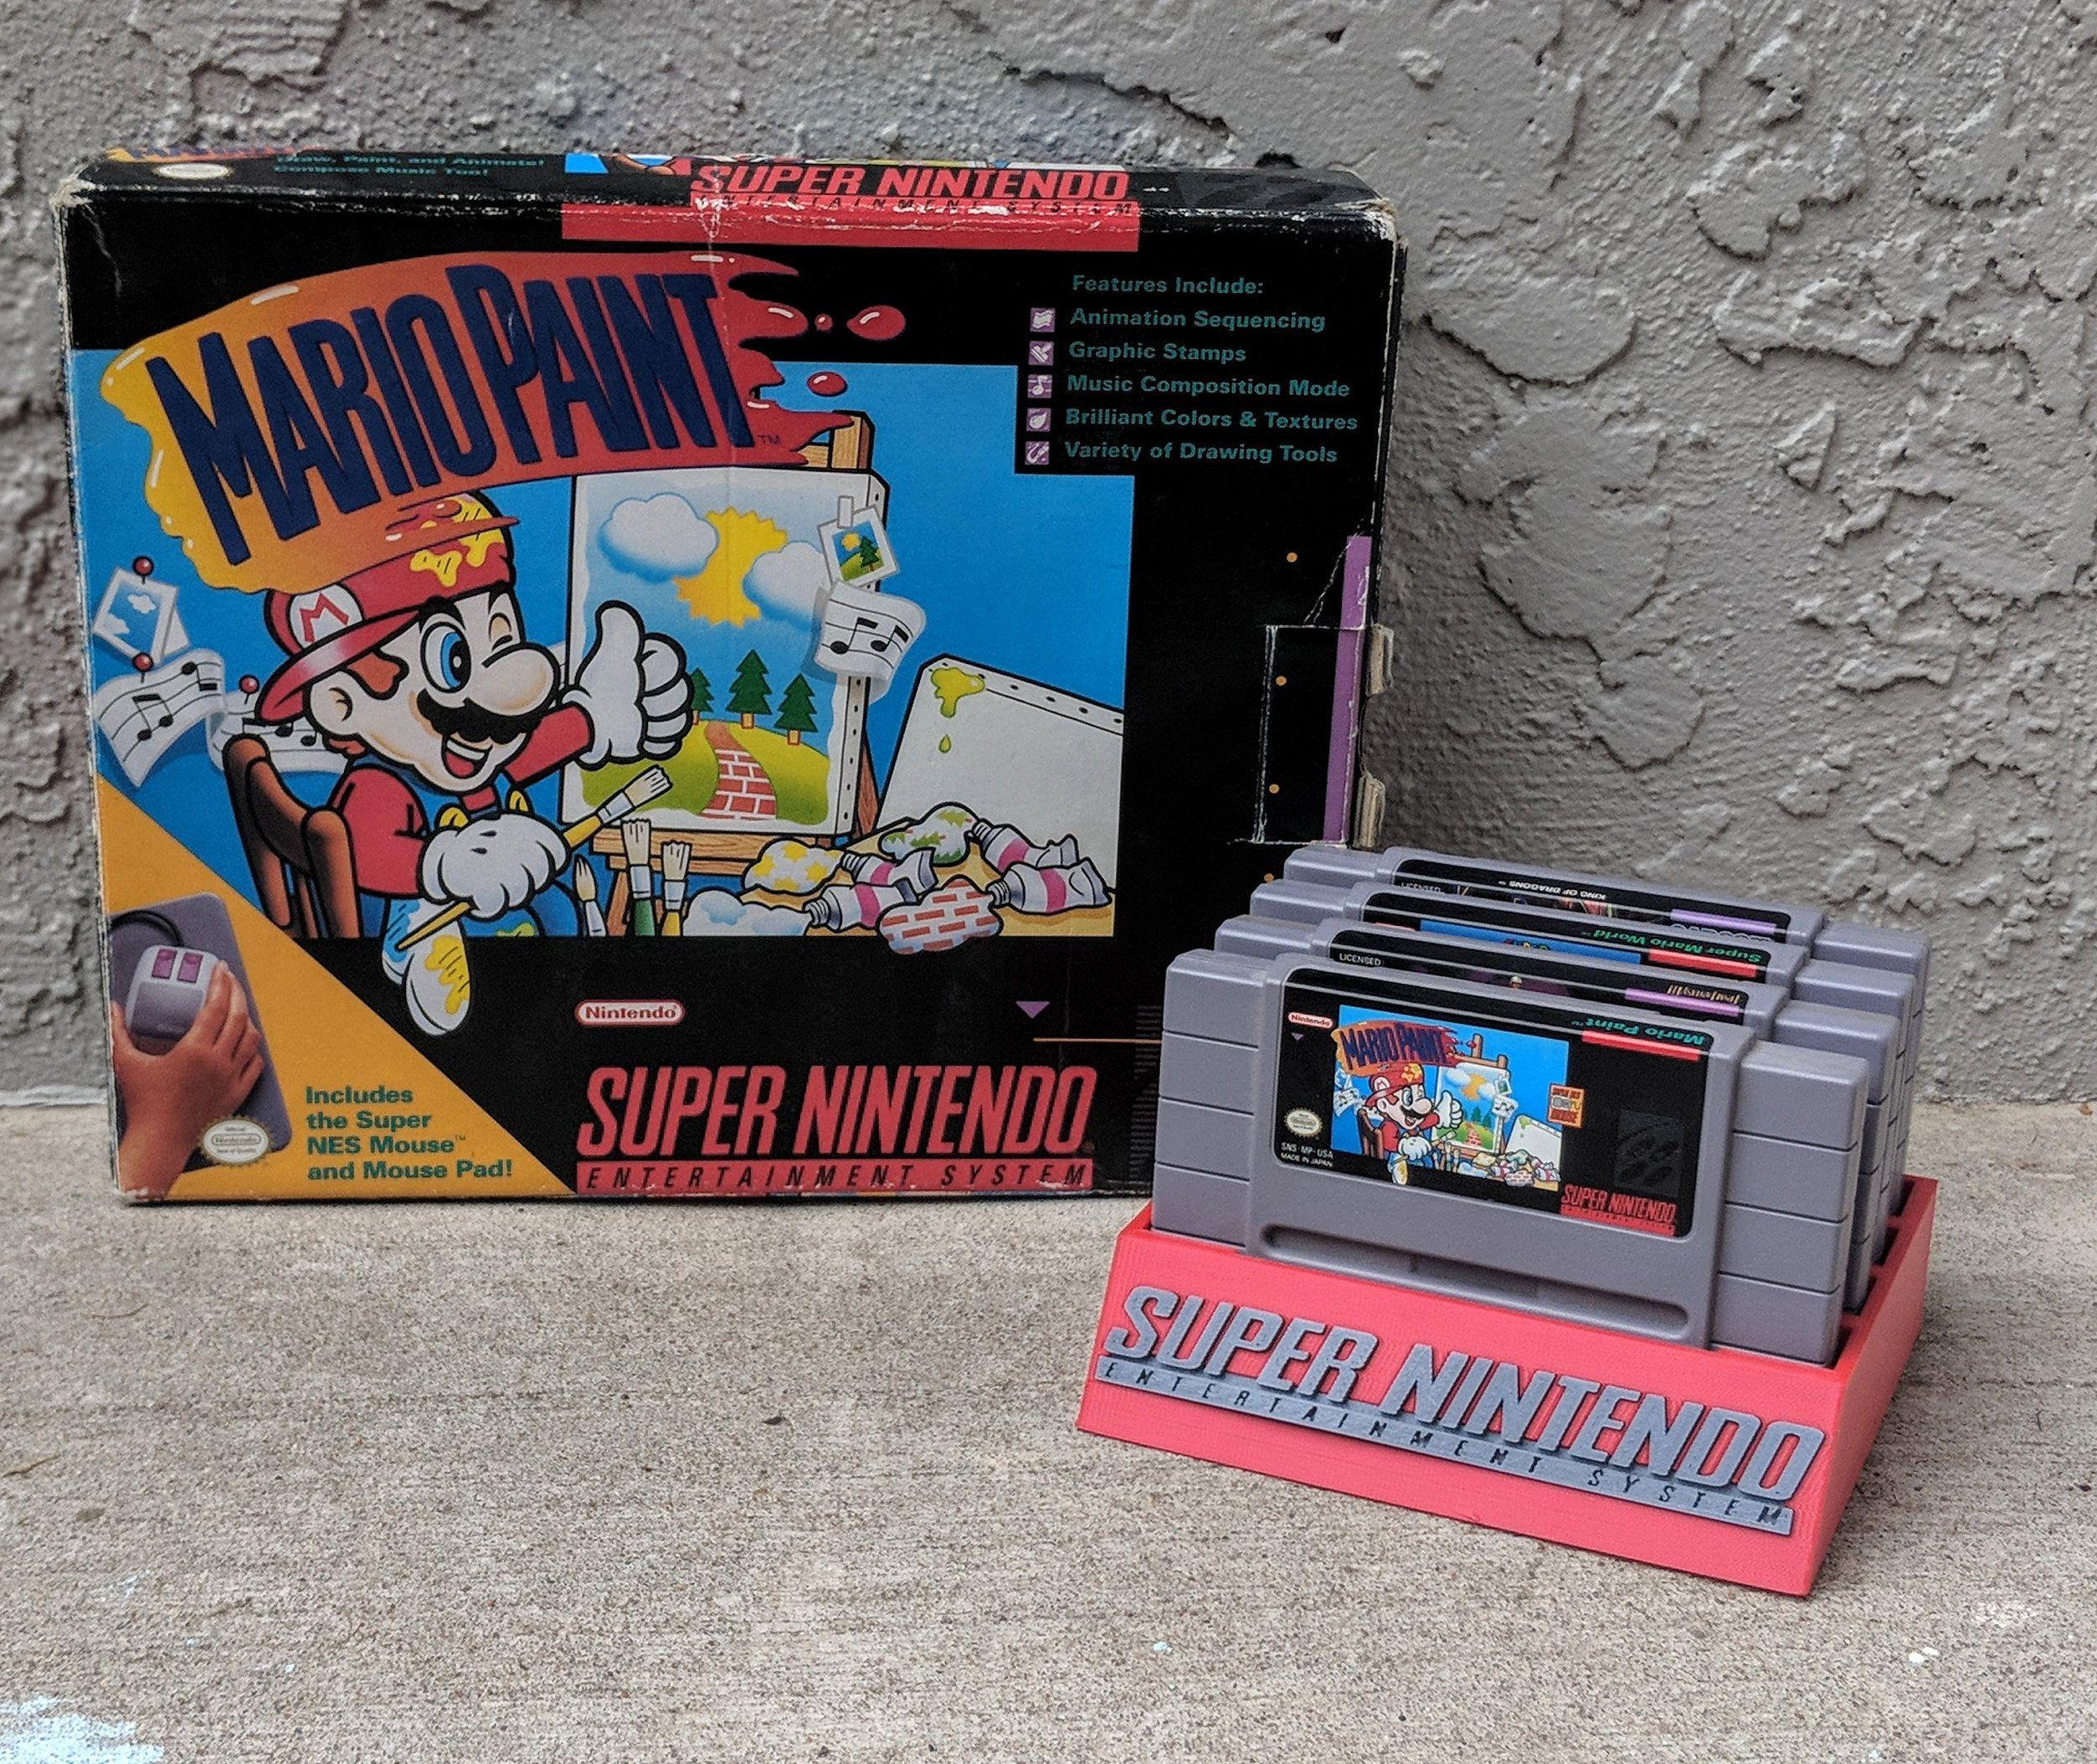 Super Nintendo Entertainment System SNES Game Cartridge